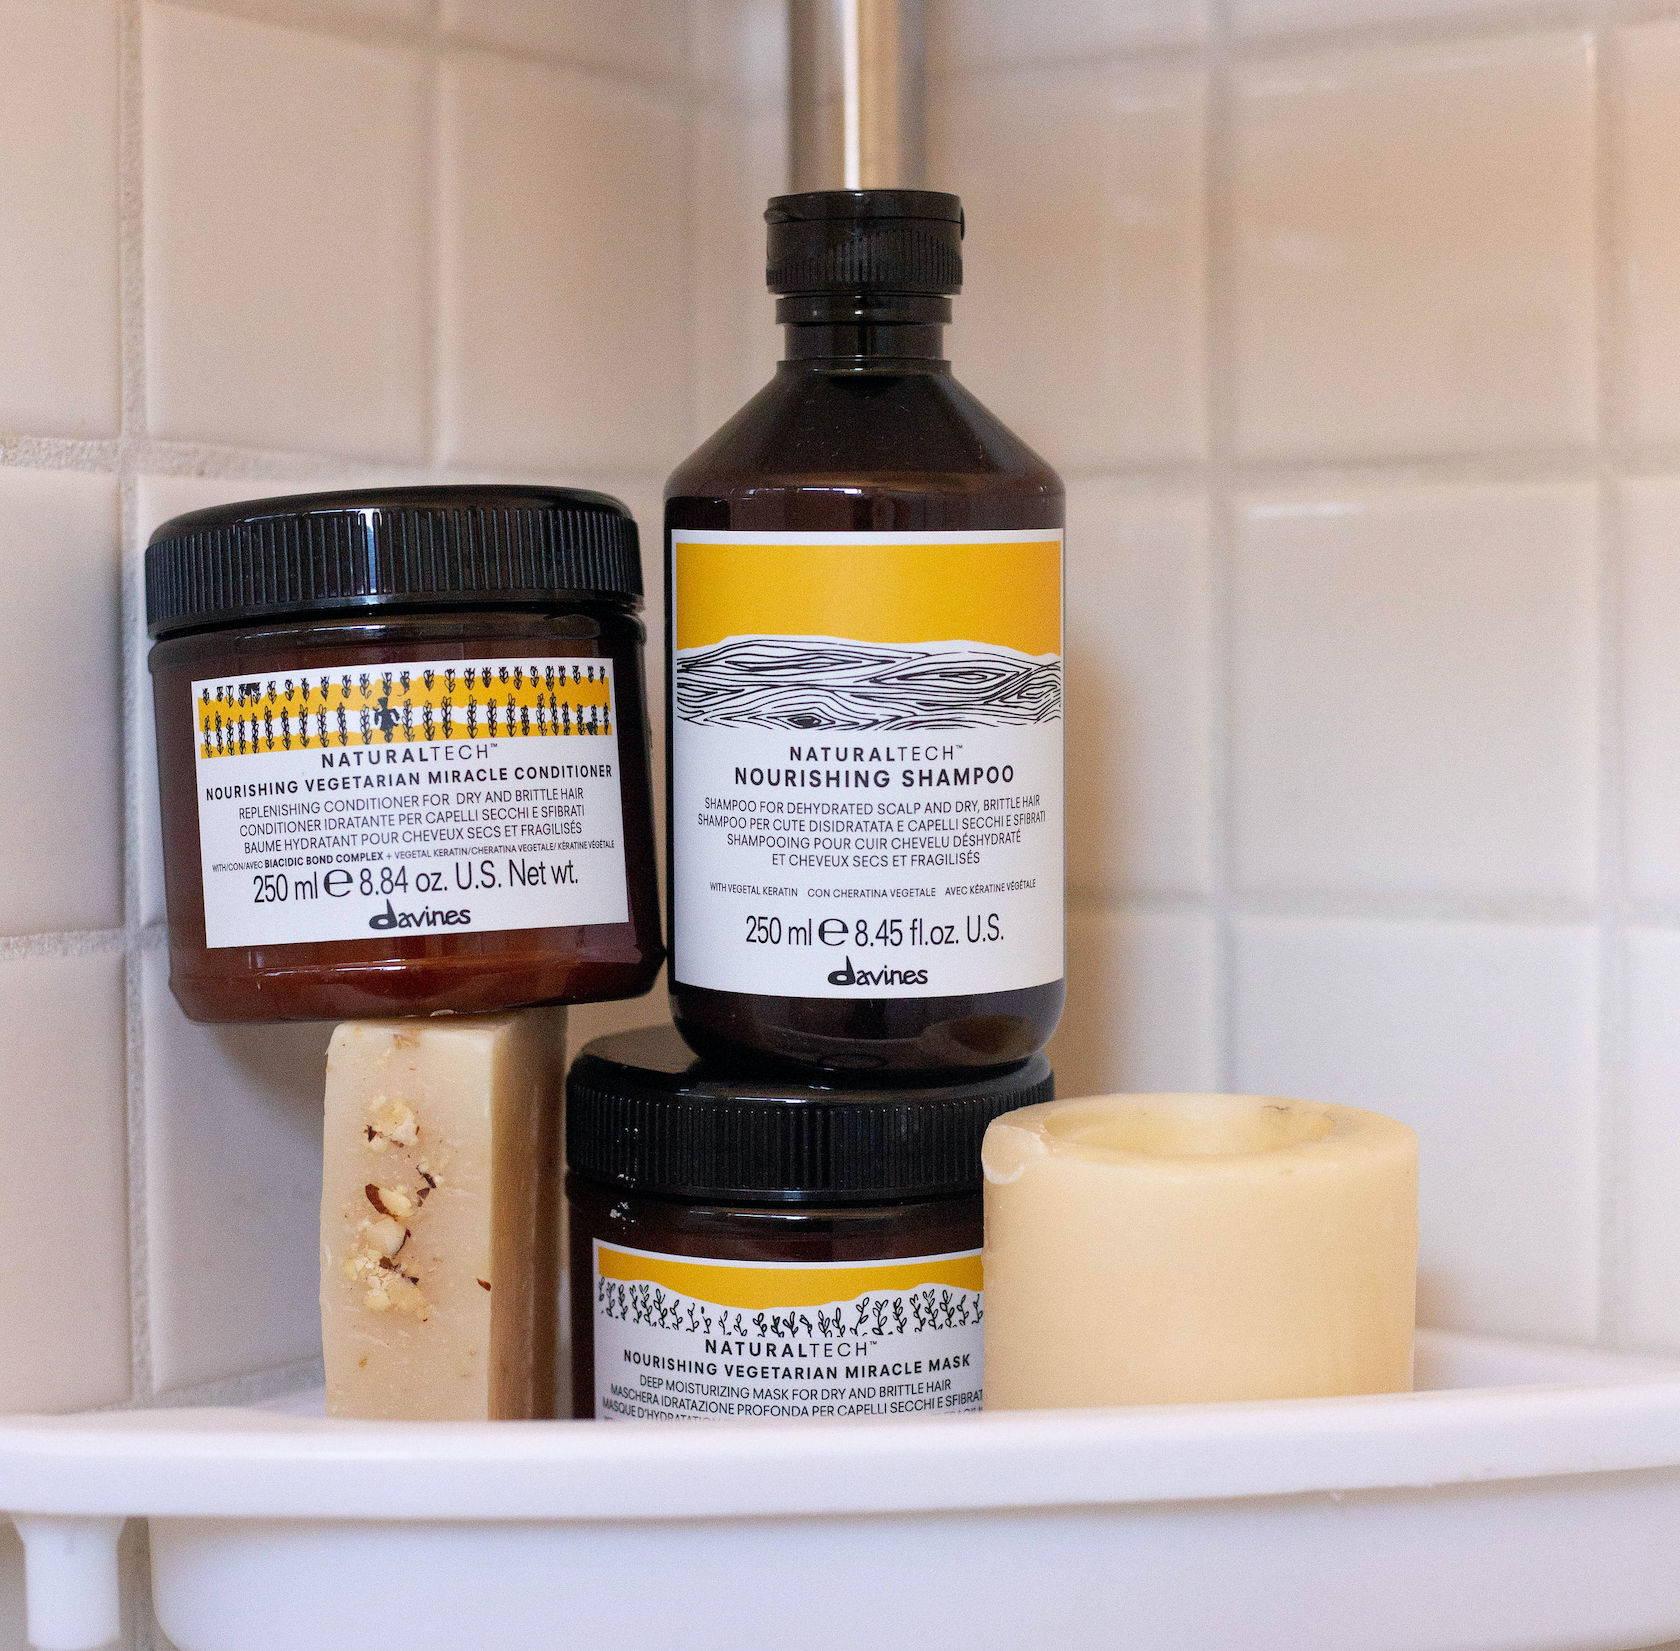 Naturaltech Nourishing Davines shower haircare